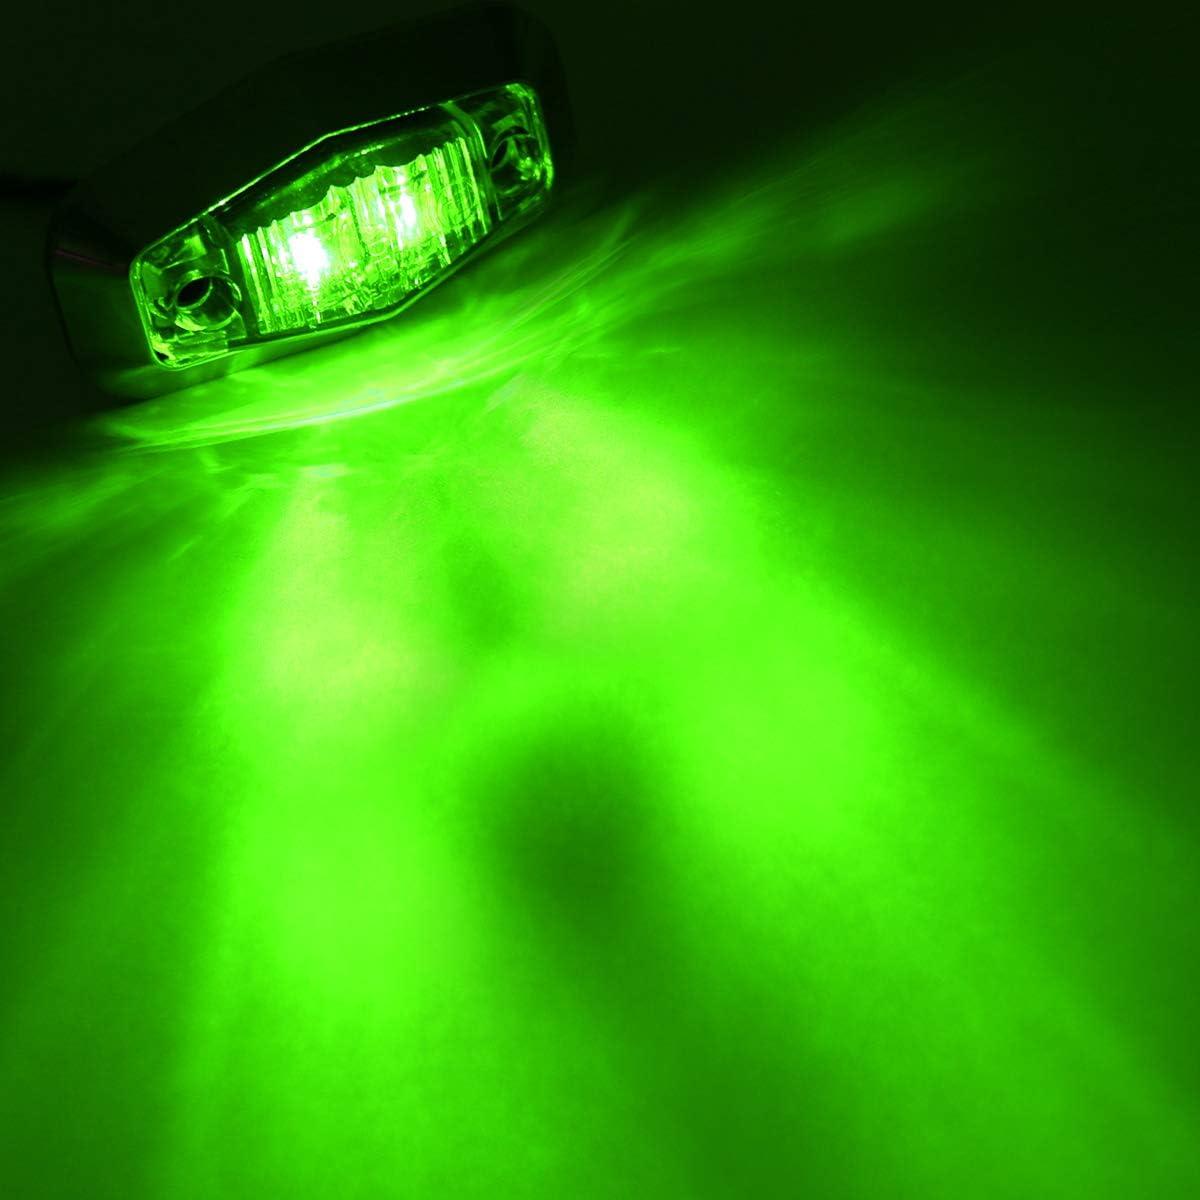 2.5 Inch Small Green Bright Side LED Marker Indicator Surface Mount Identification Lights Clearance Sealed Mini Bulb Van Boat Car Cab Trailer Camper Truck 12v DC Waterproof AA12 Pack of 2 Meerkatt